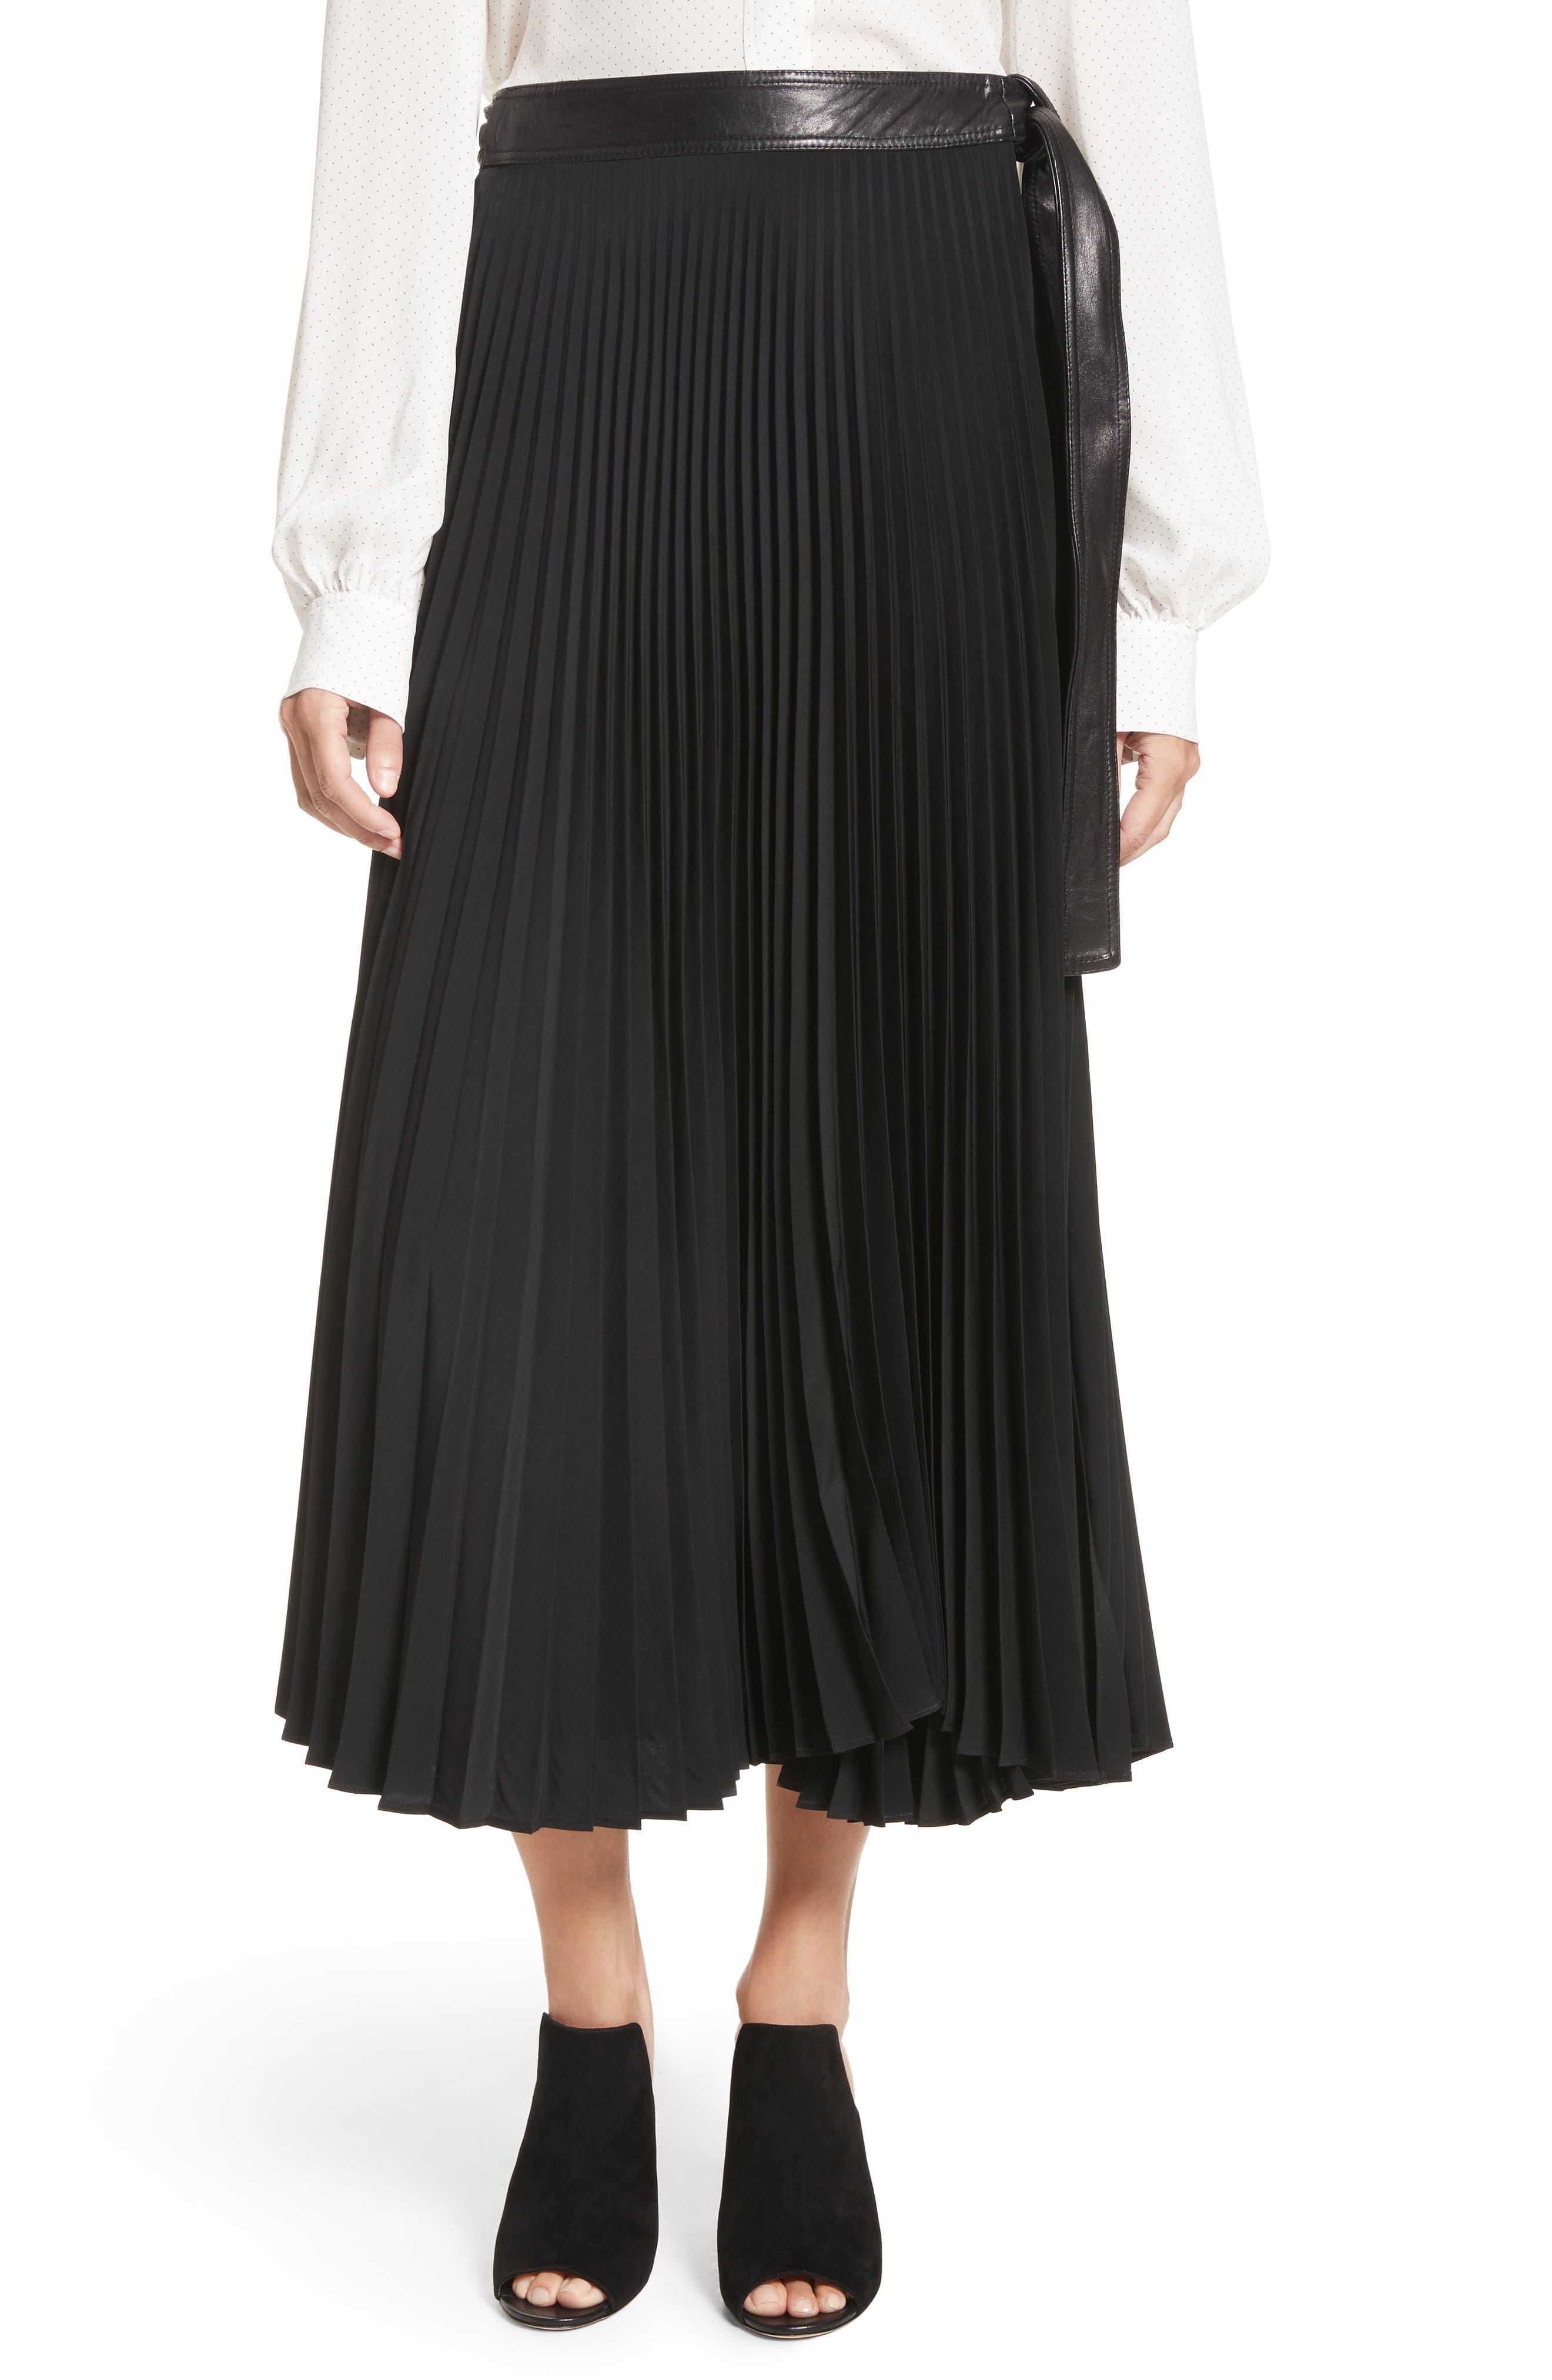 Alternate Image 1 Selected - A.L.C. Anika Leather Trim Pleated Midi Skirt